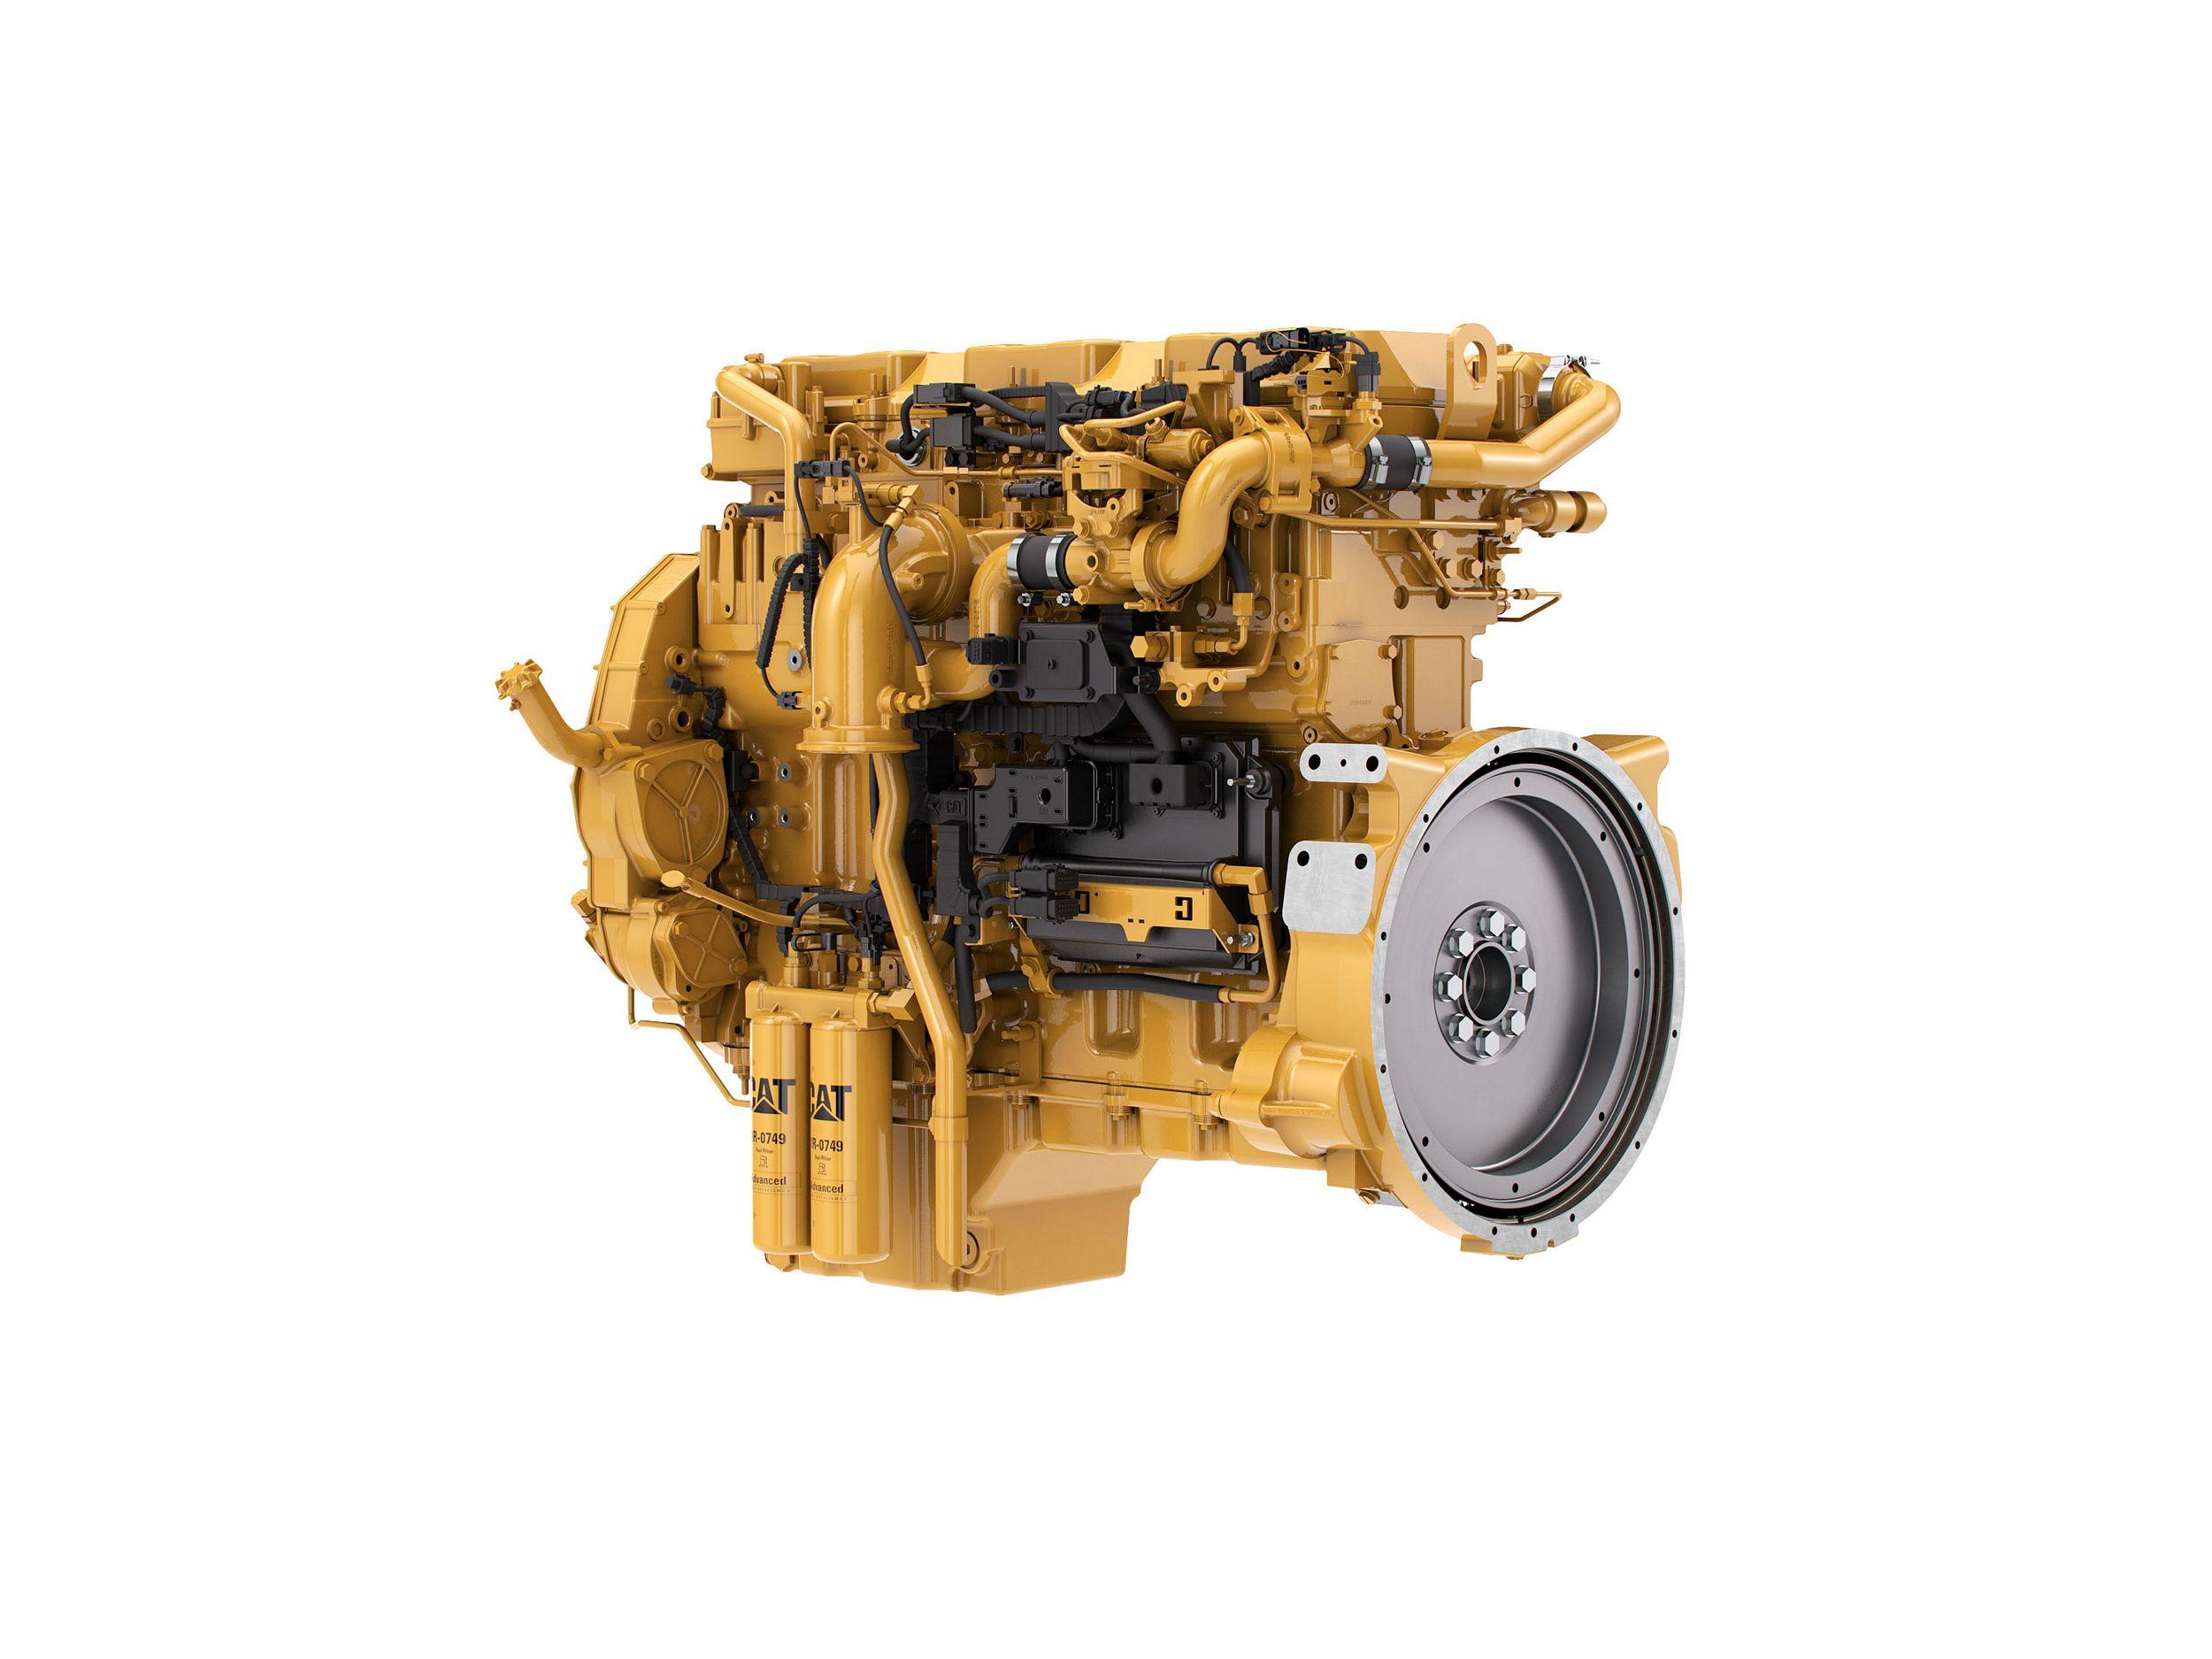 C13 Tier 4 Diesel Engines – Highly Regulated